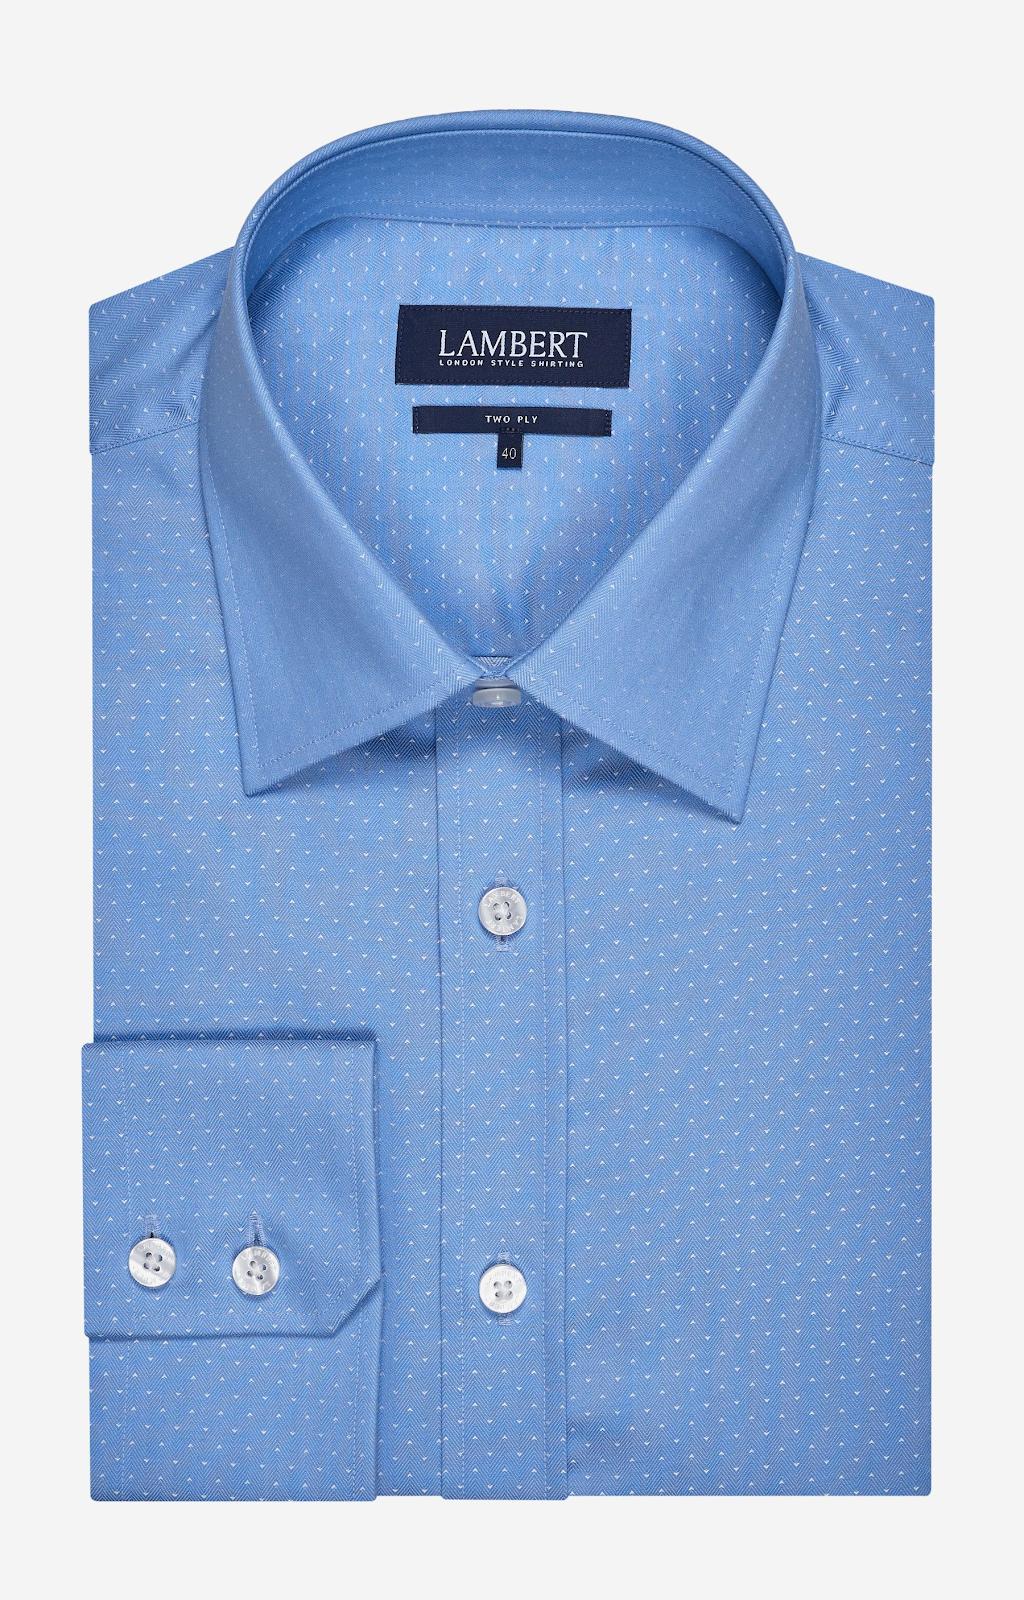 Błekitna koszula marki Lambert z delikatnym wzorem